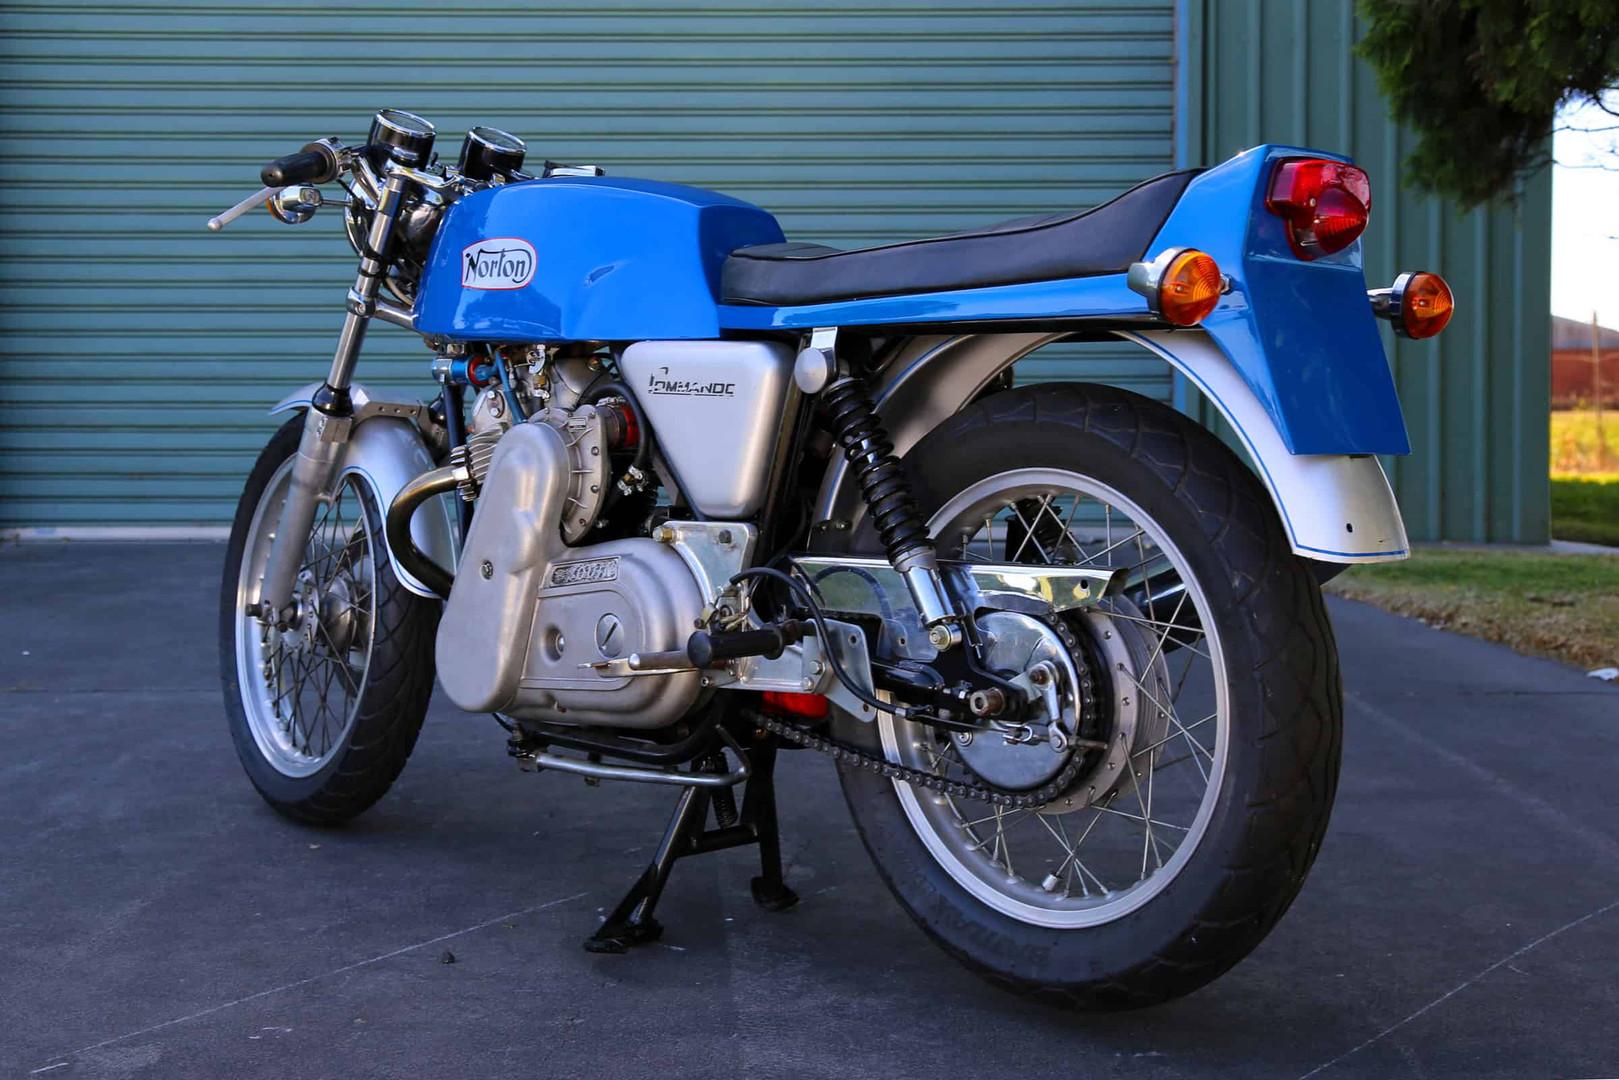 1974-Norton-Supercharged-blue-b45ls.jpg